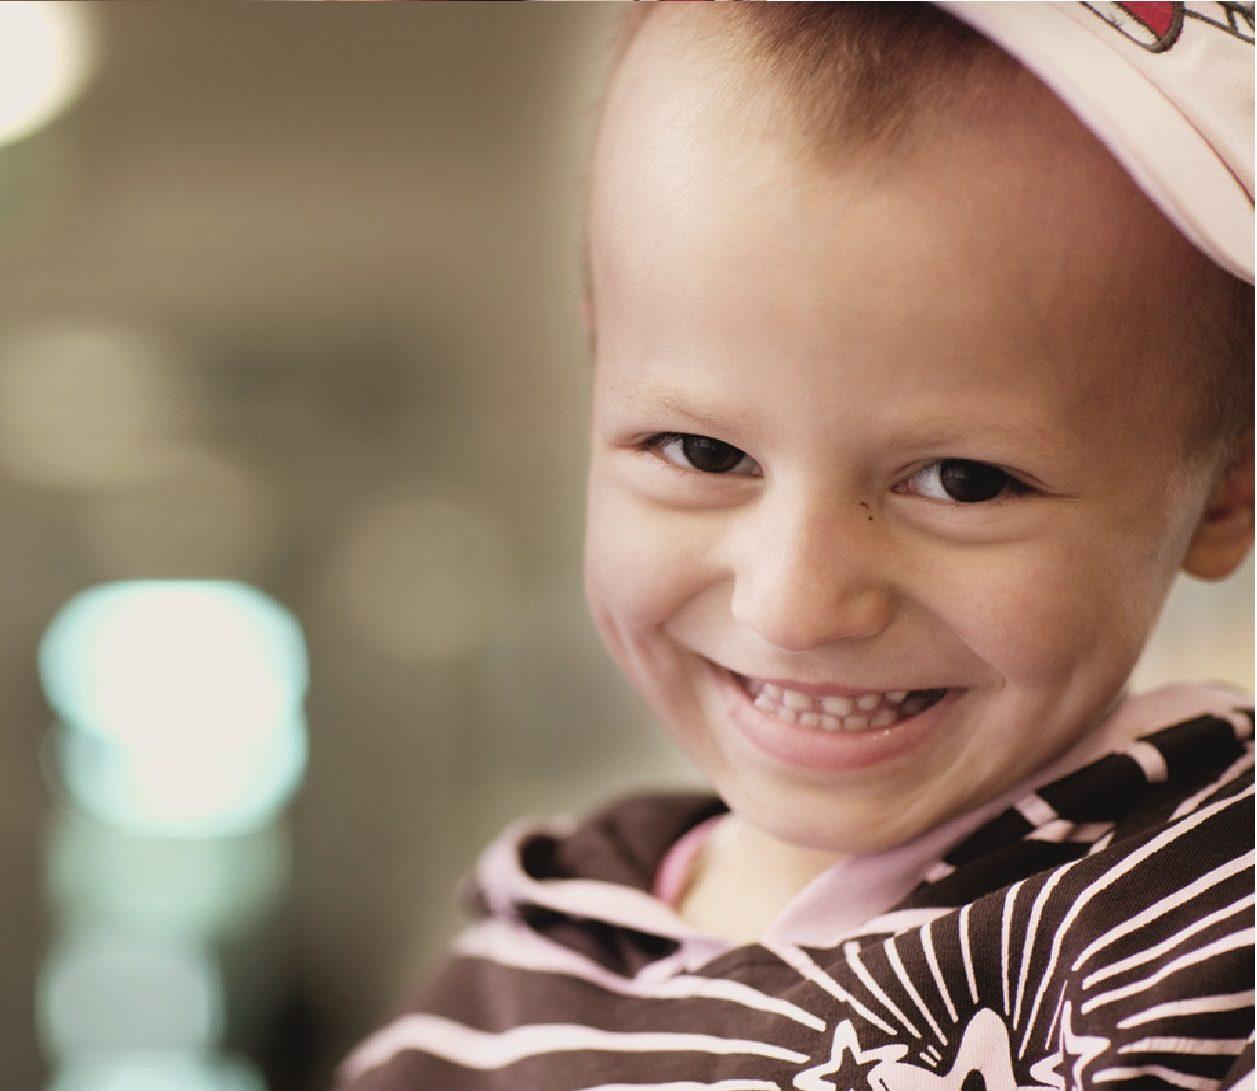 European pediatric Acute Leukemia (EupAL) foundation